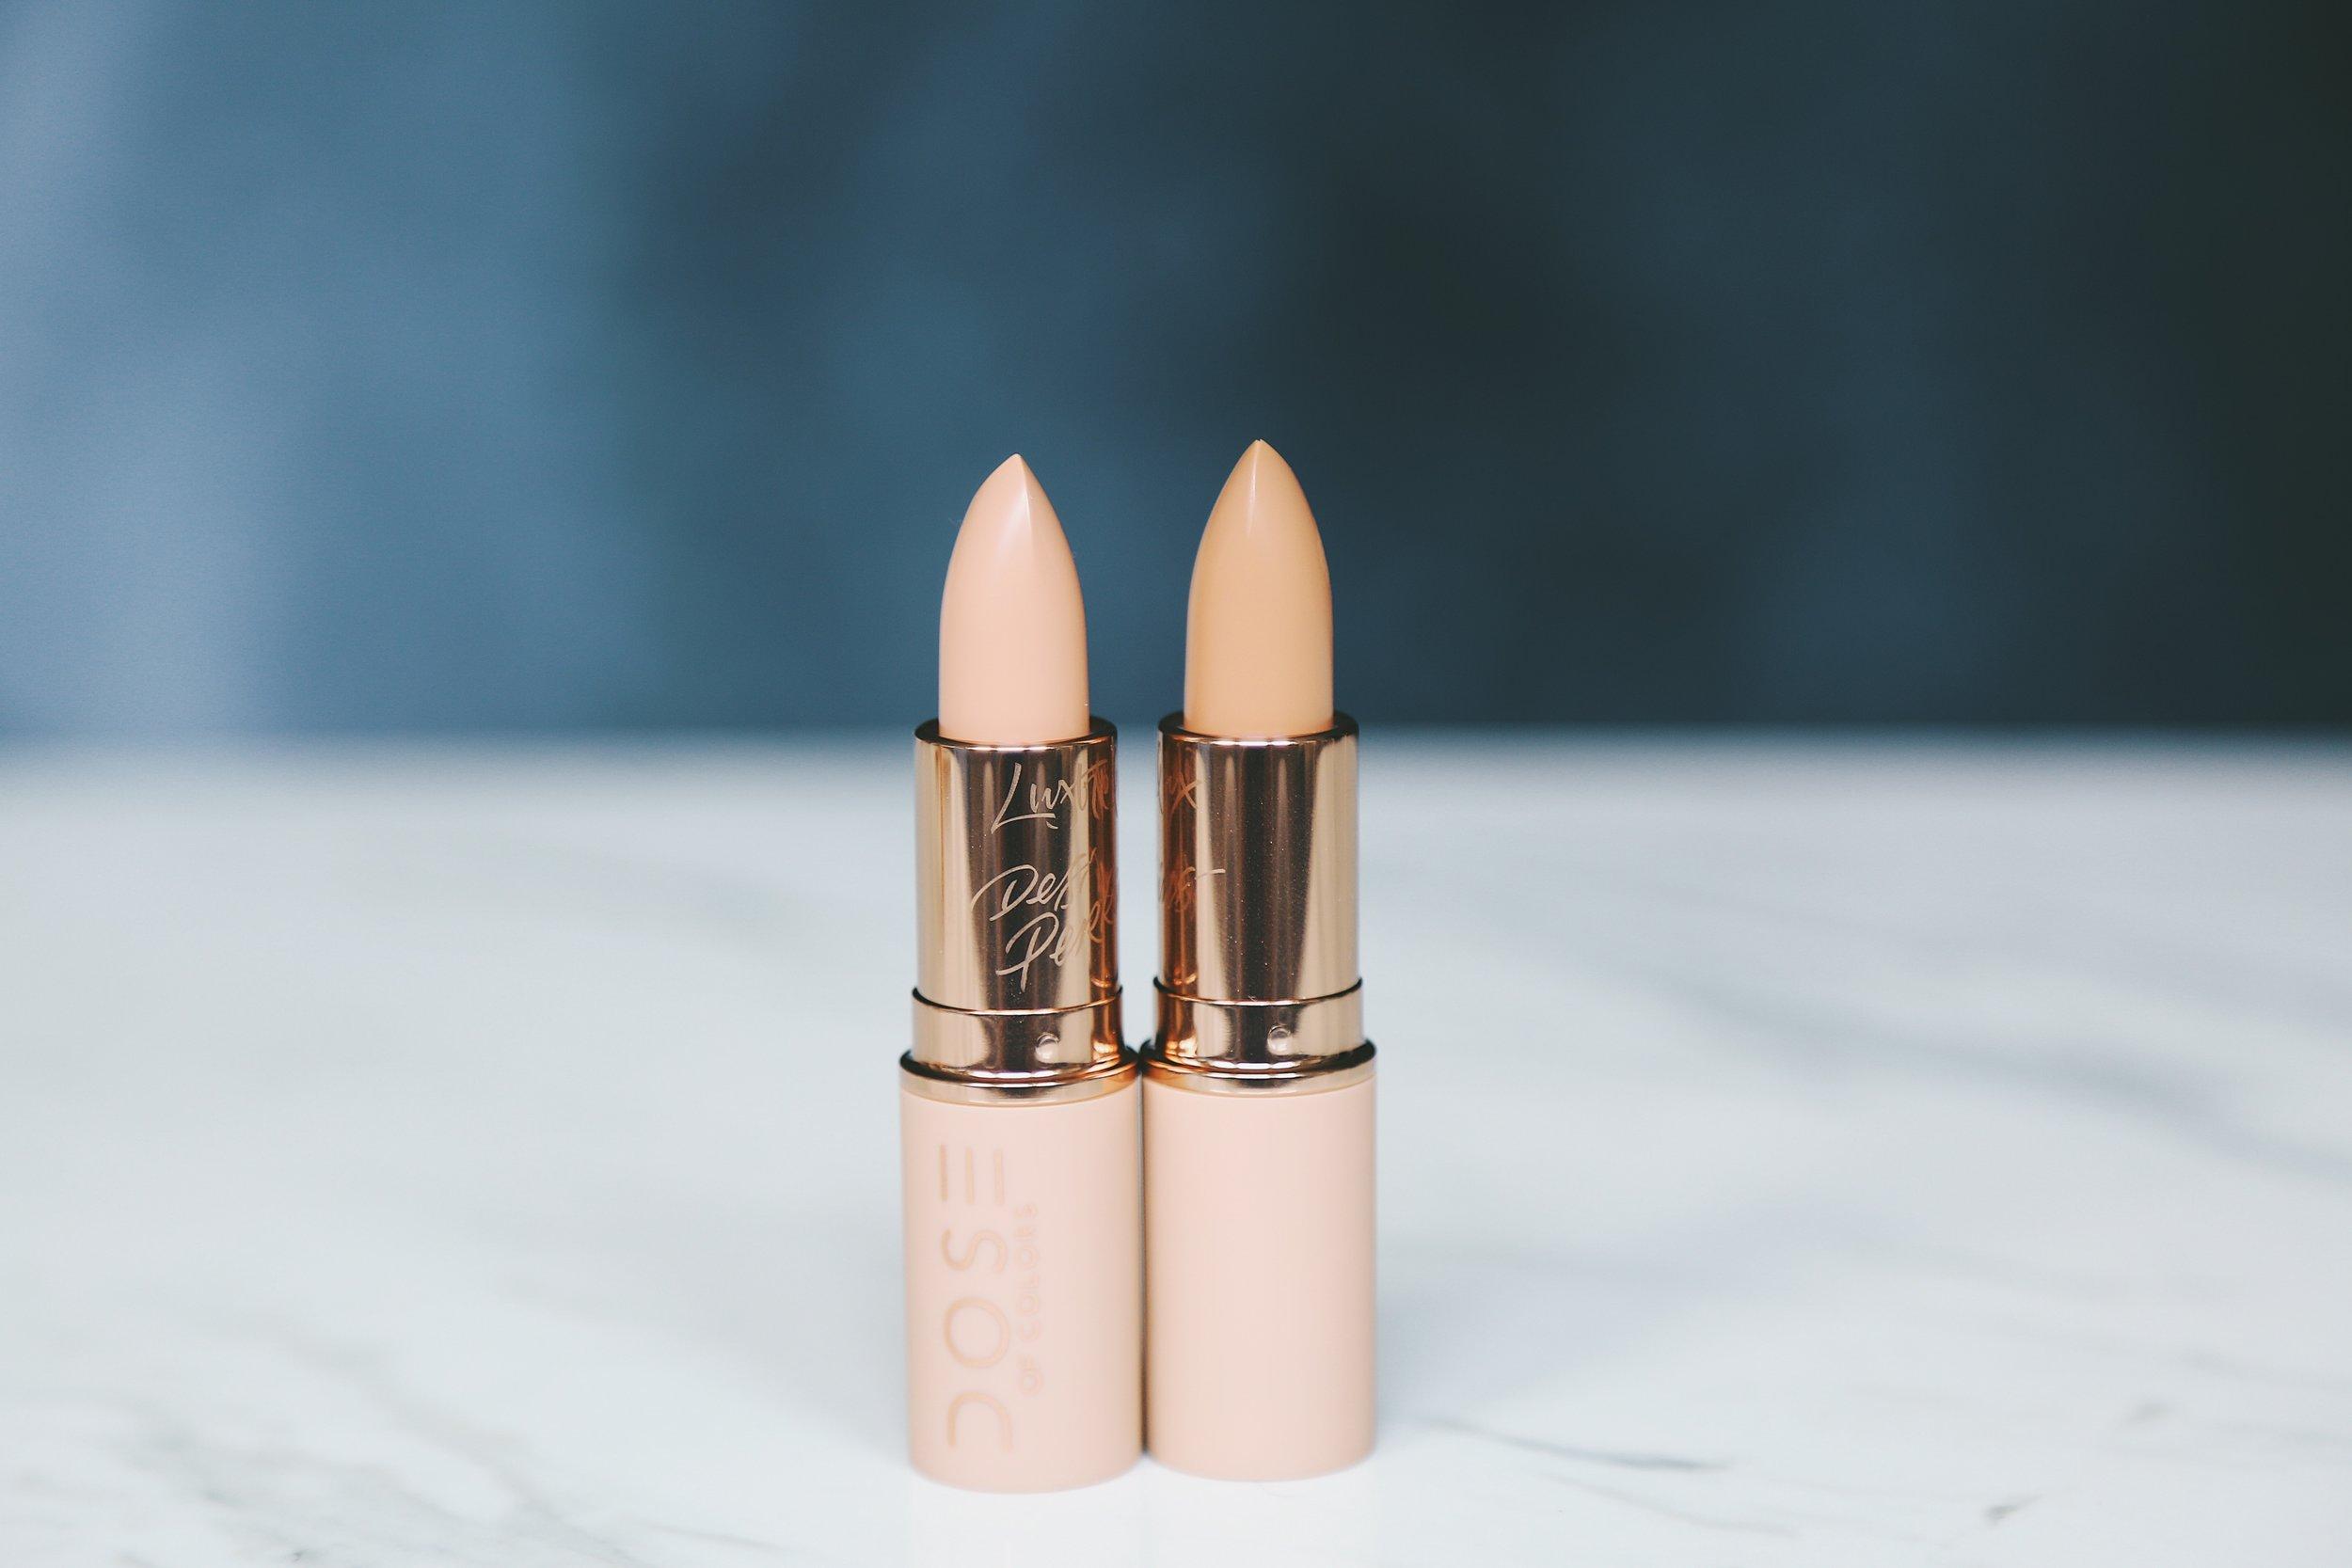 Dose of Colors Desi x Katy collaboration lipstick